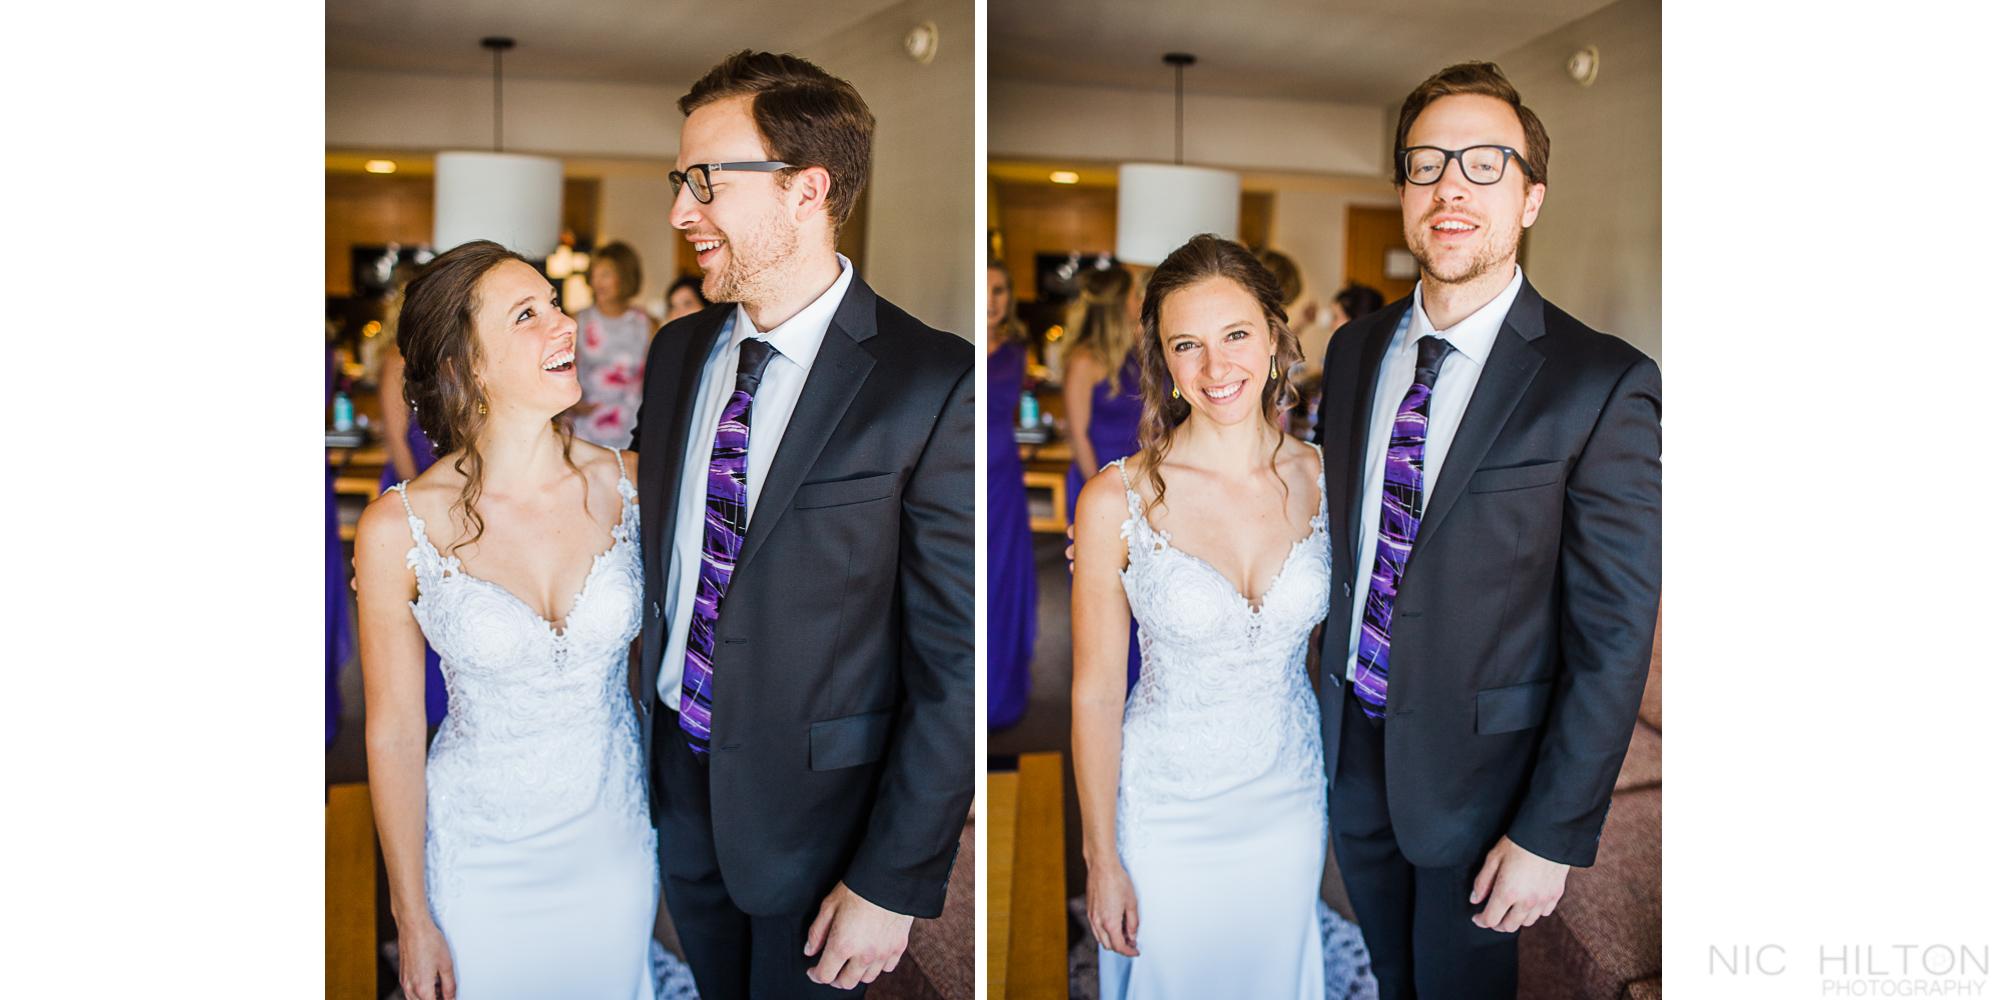 bride-and-man-of-honor-wedding-june-lake.jpg